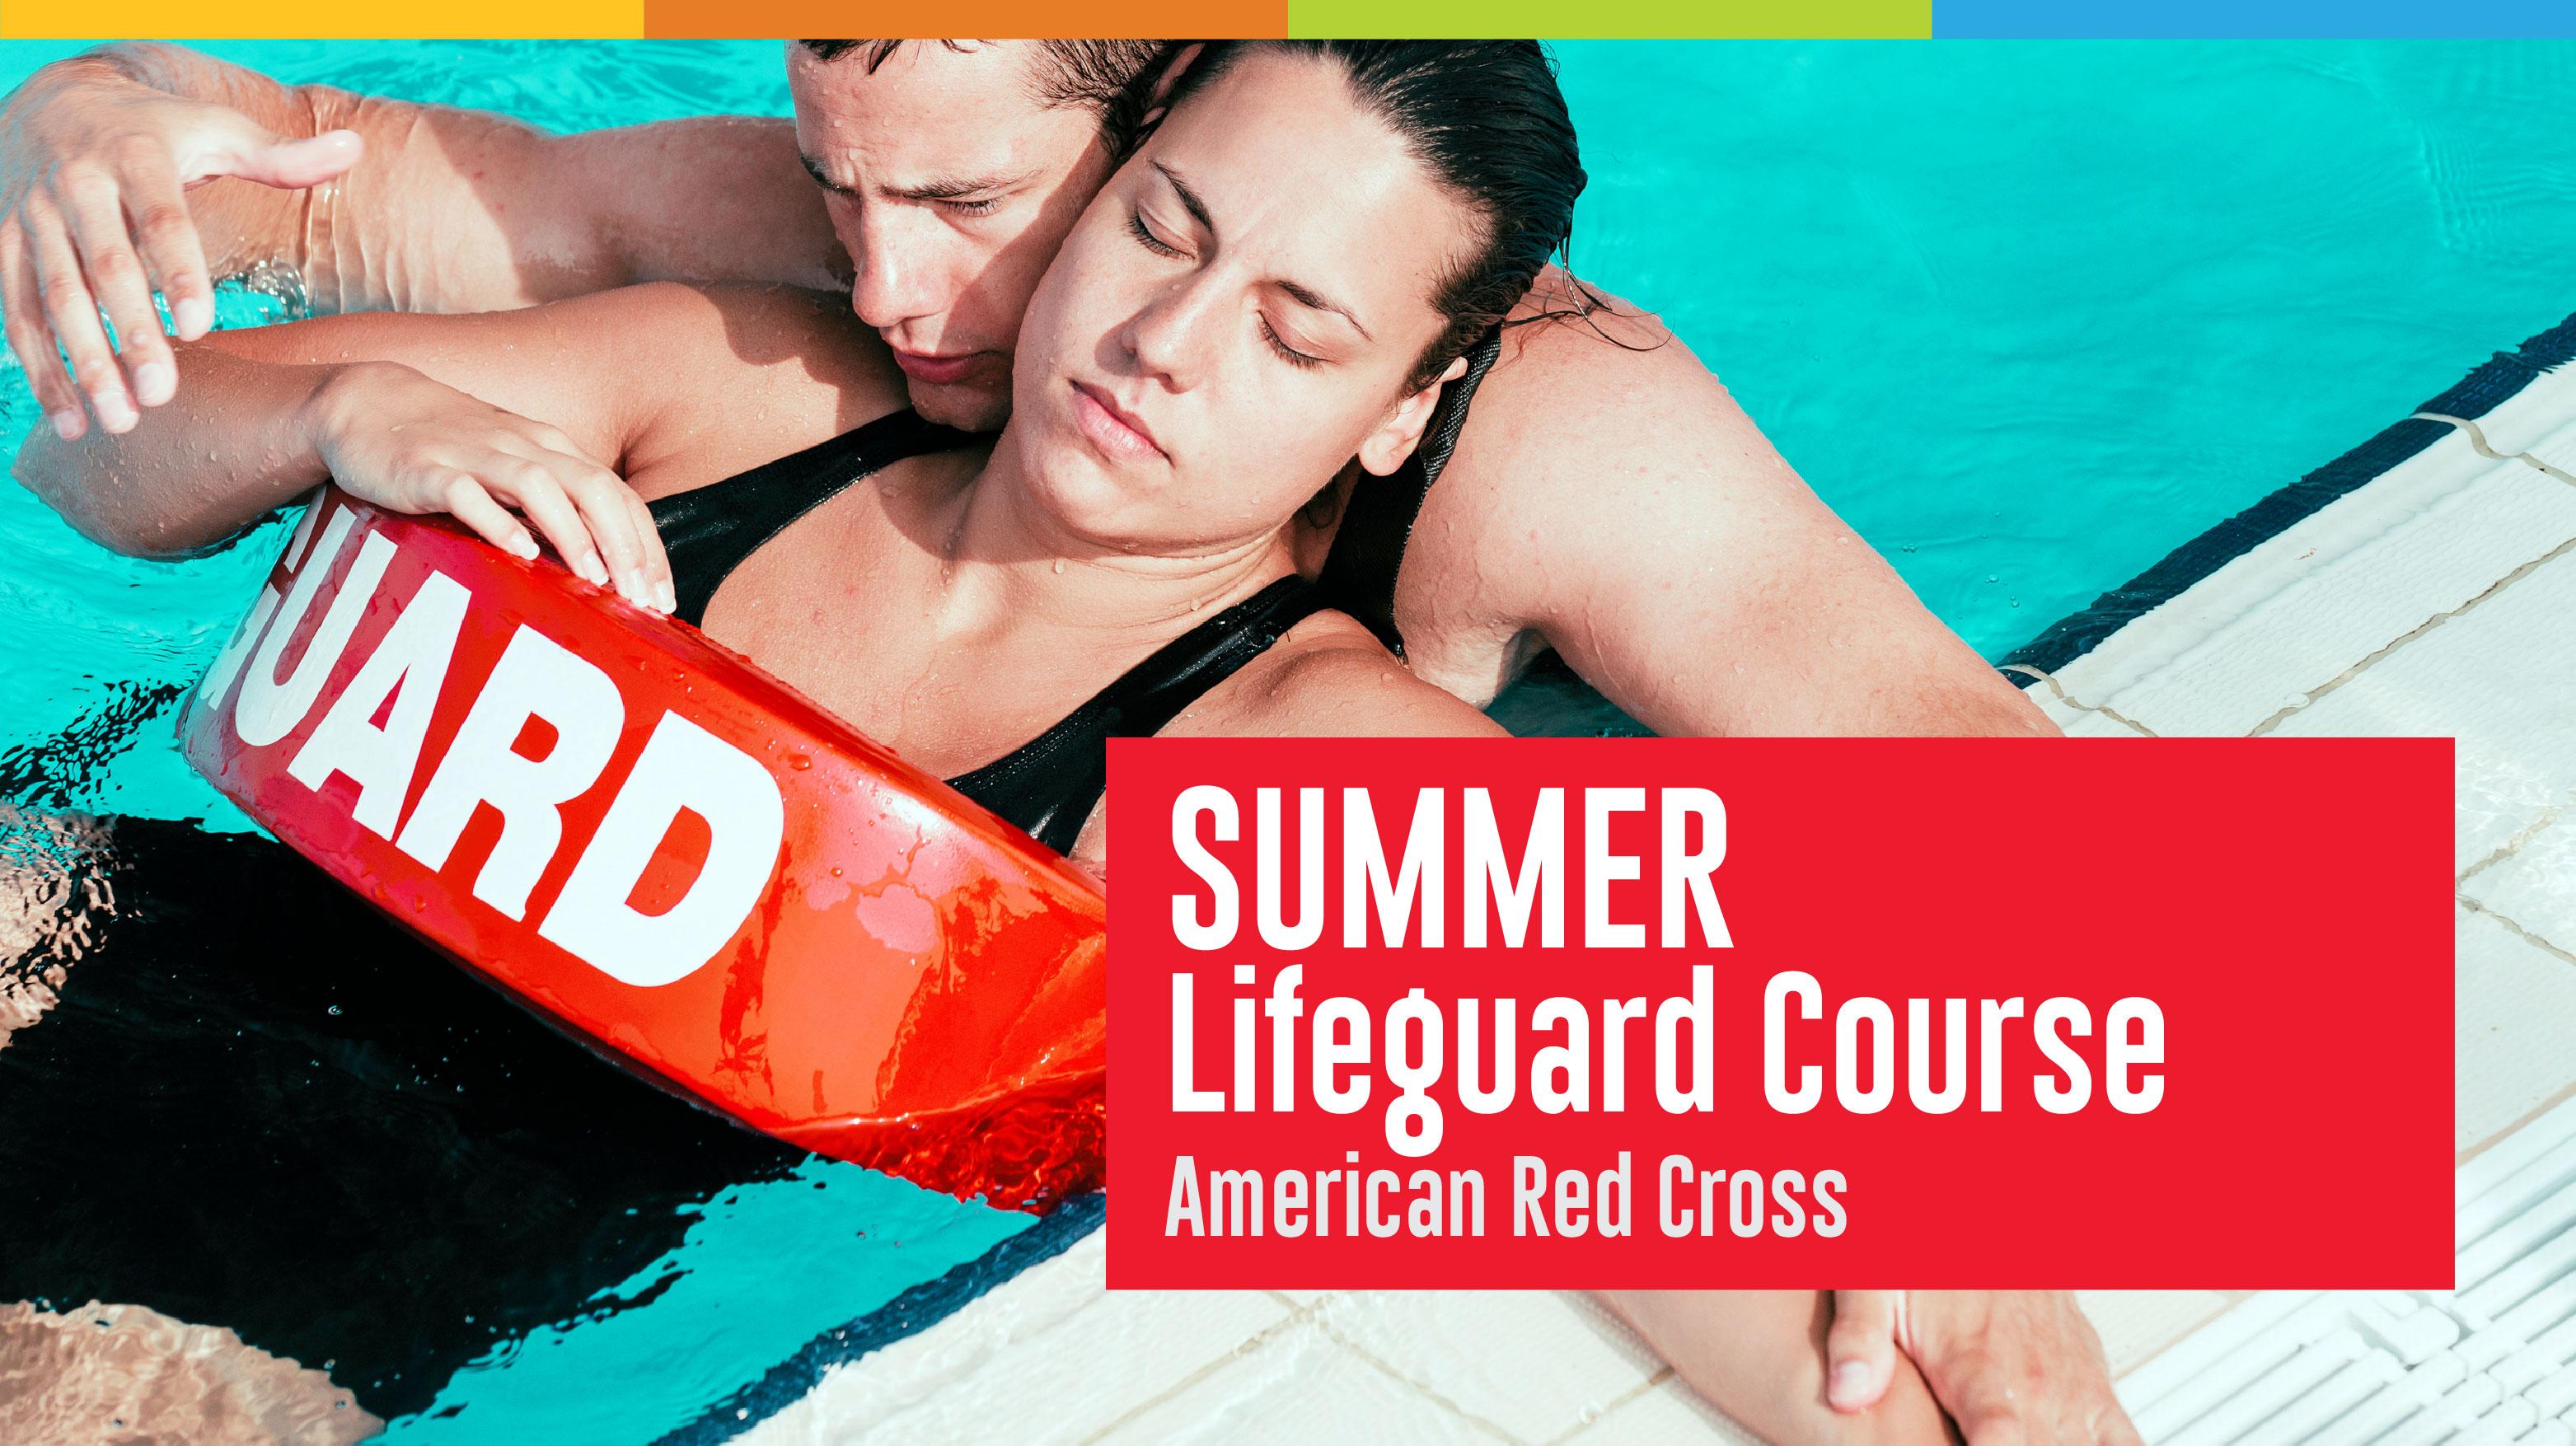 Summer Lifeguard Course Registration